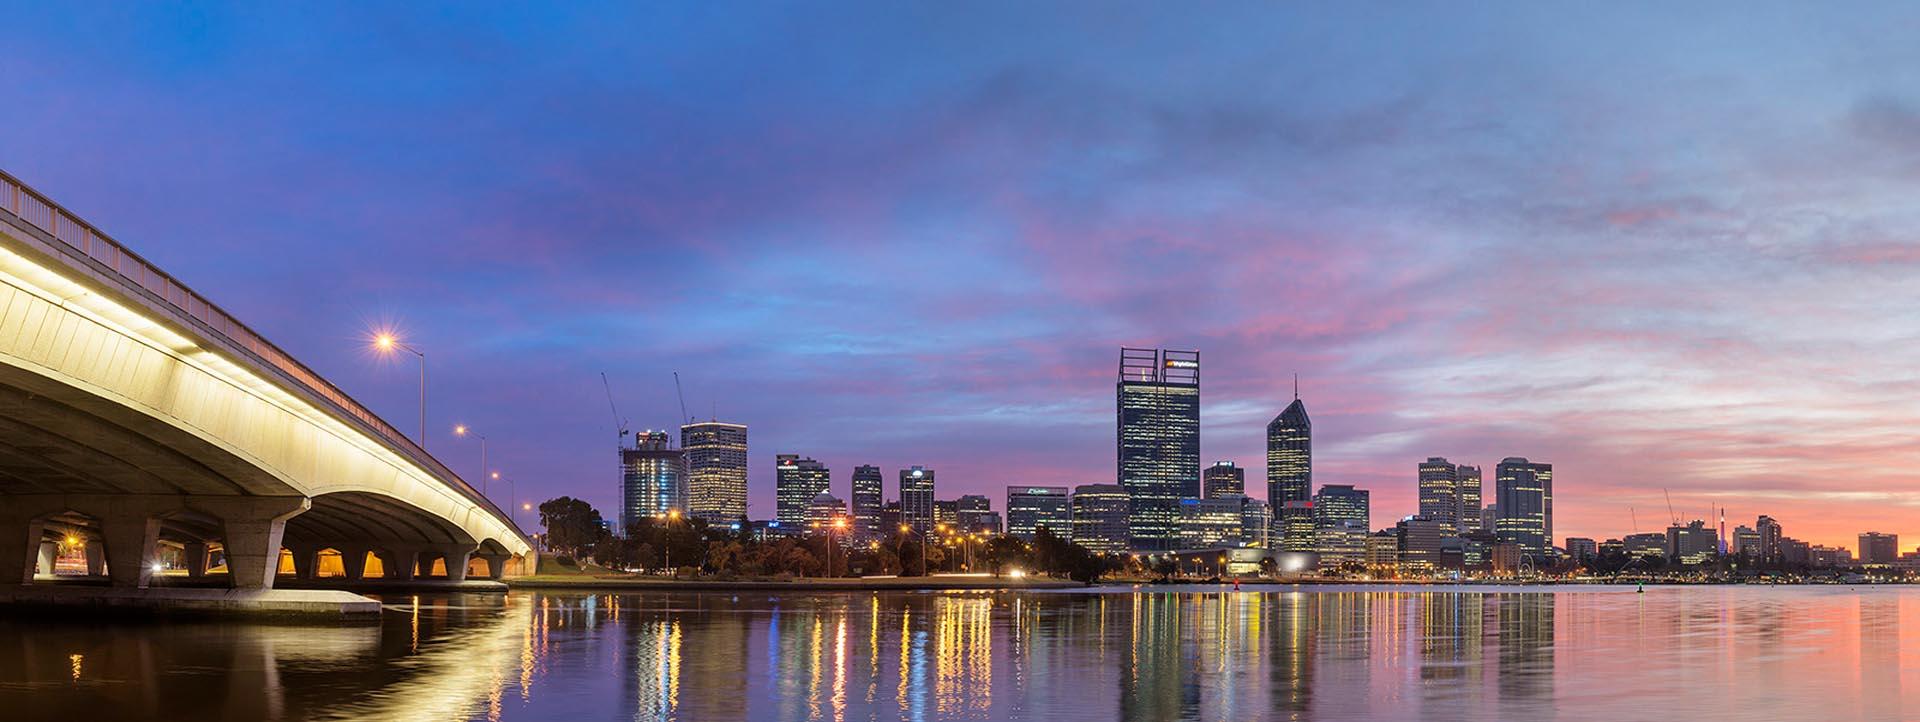 Perth city transfer cruises